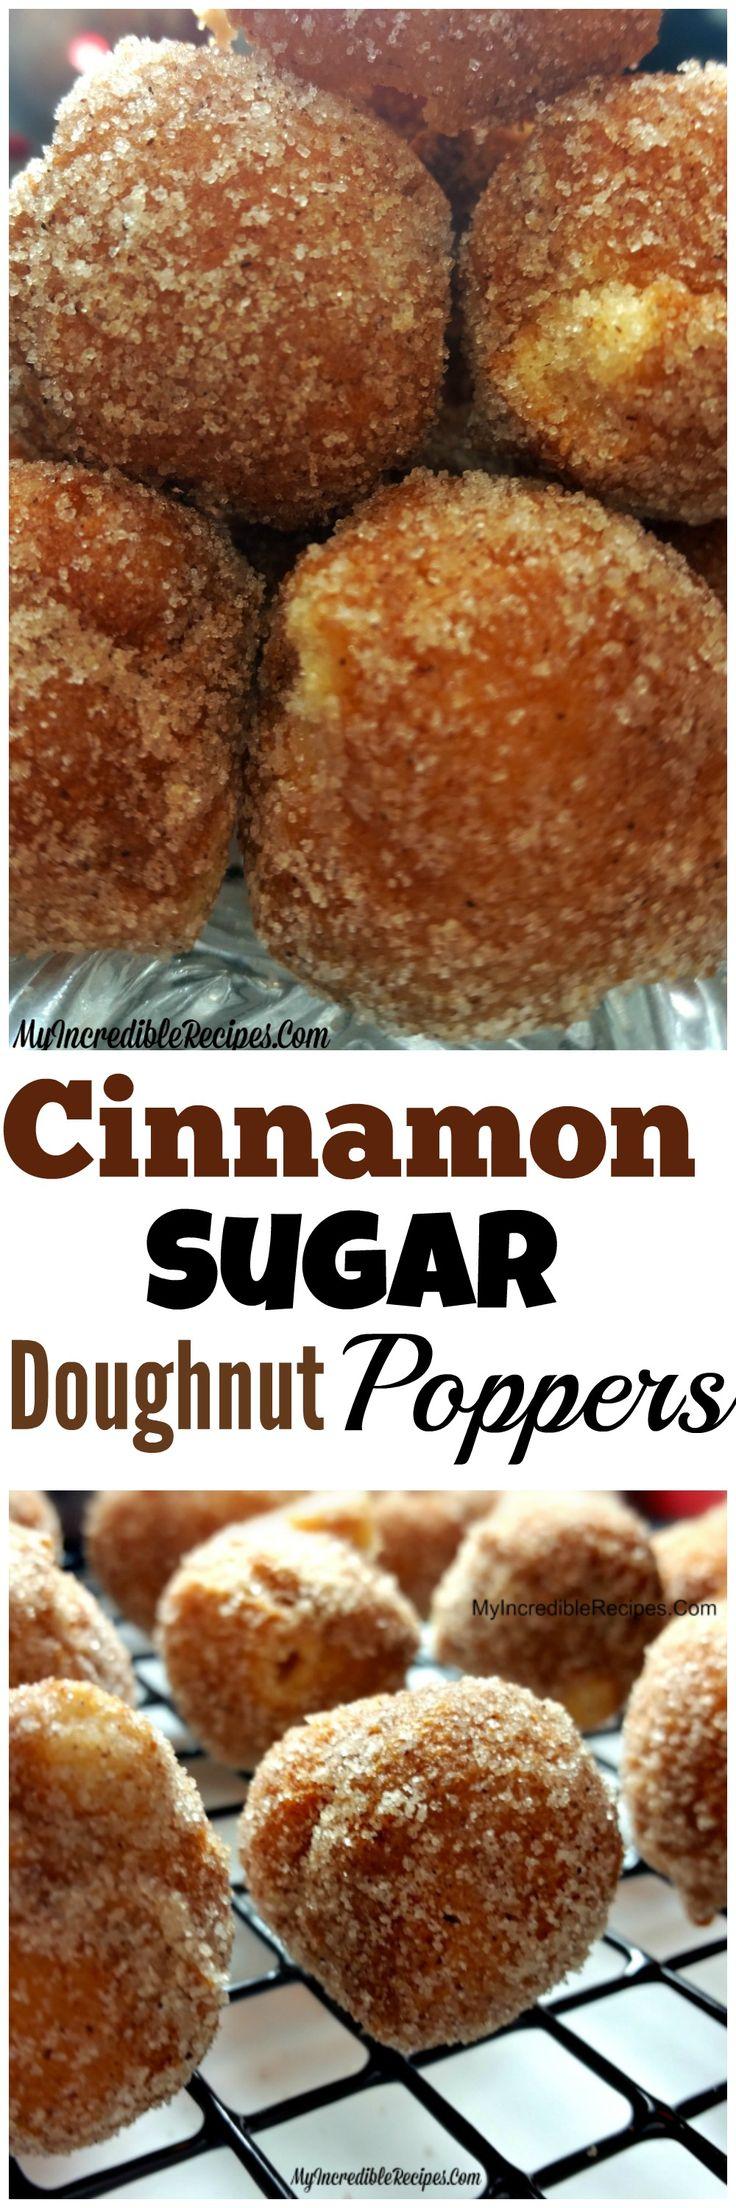 Cinnamon Sugar Doughnut Holes – BITE SIZE